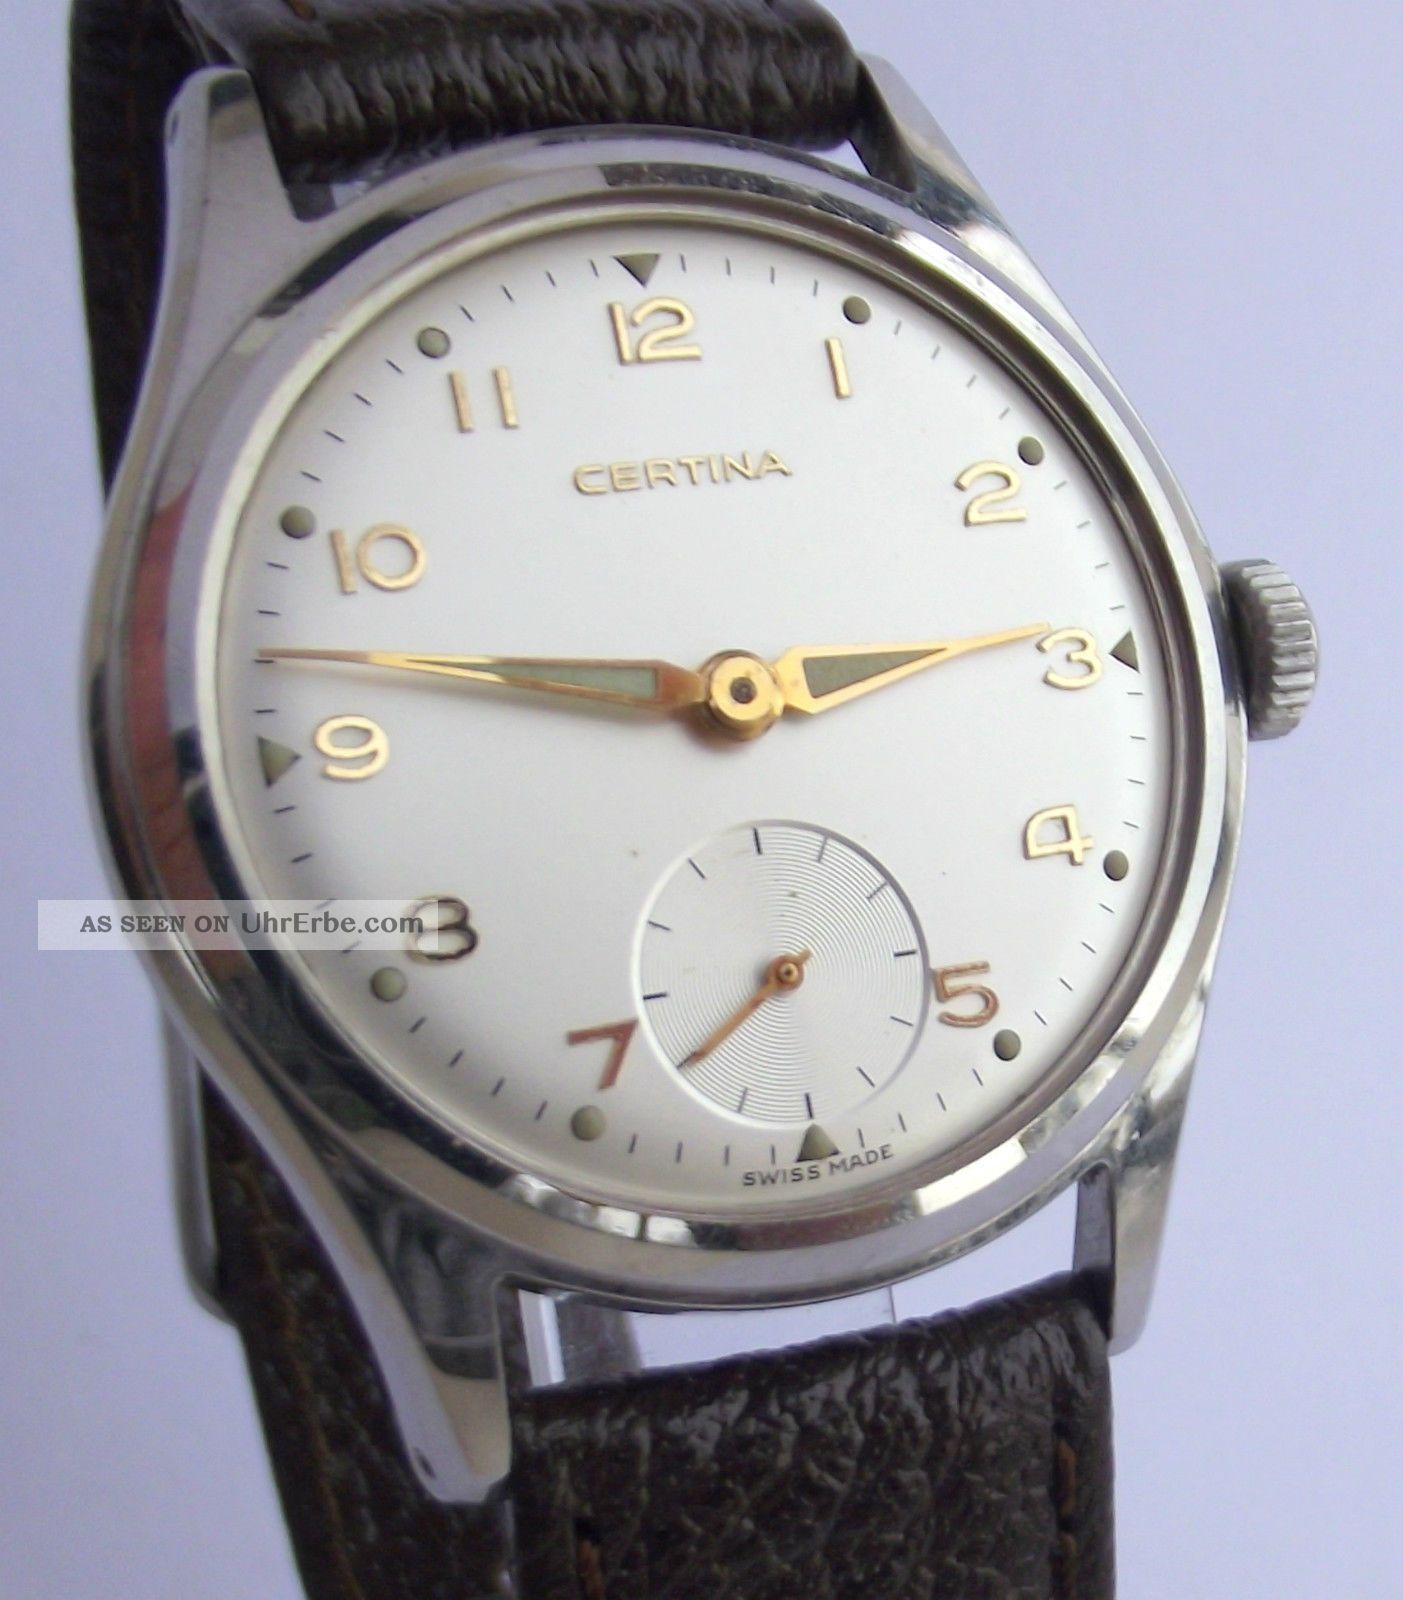 Hau Certina,  Cal.  Certina 320,  Um 1960 Armbanduhren Bild